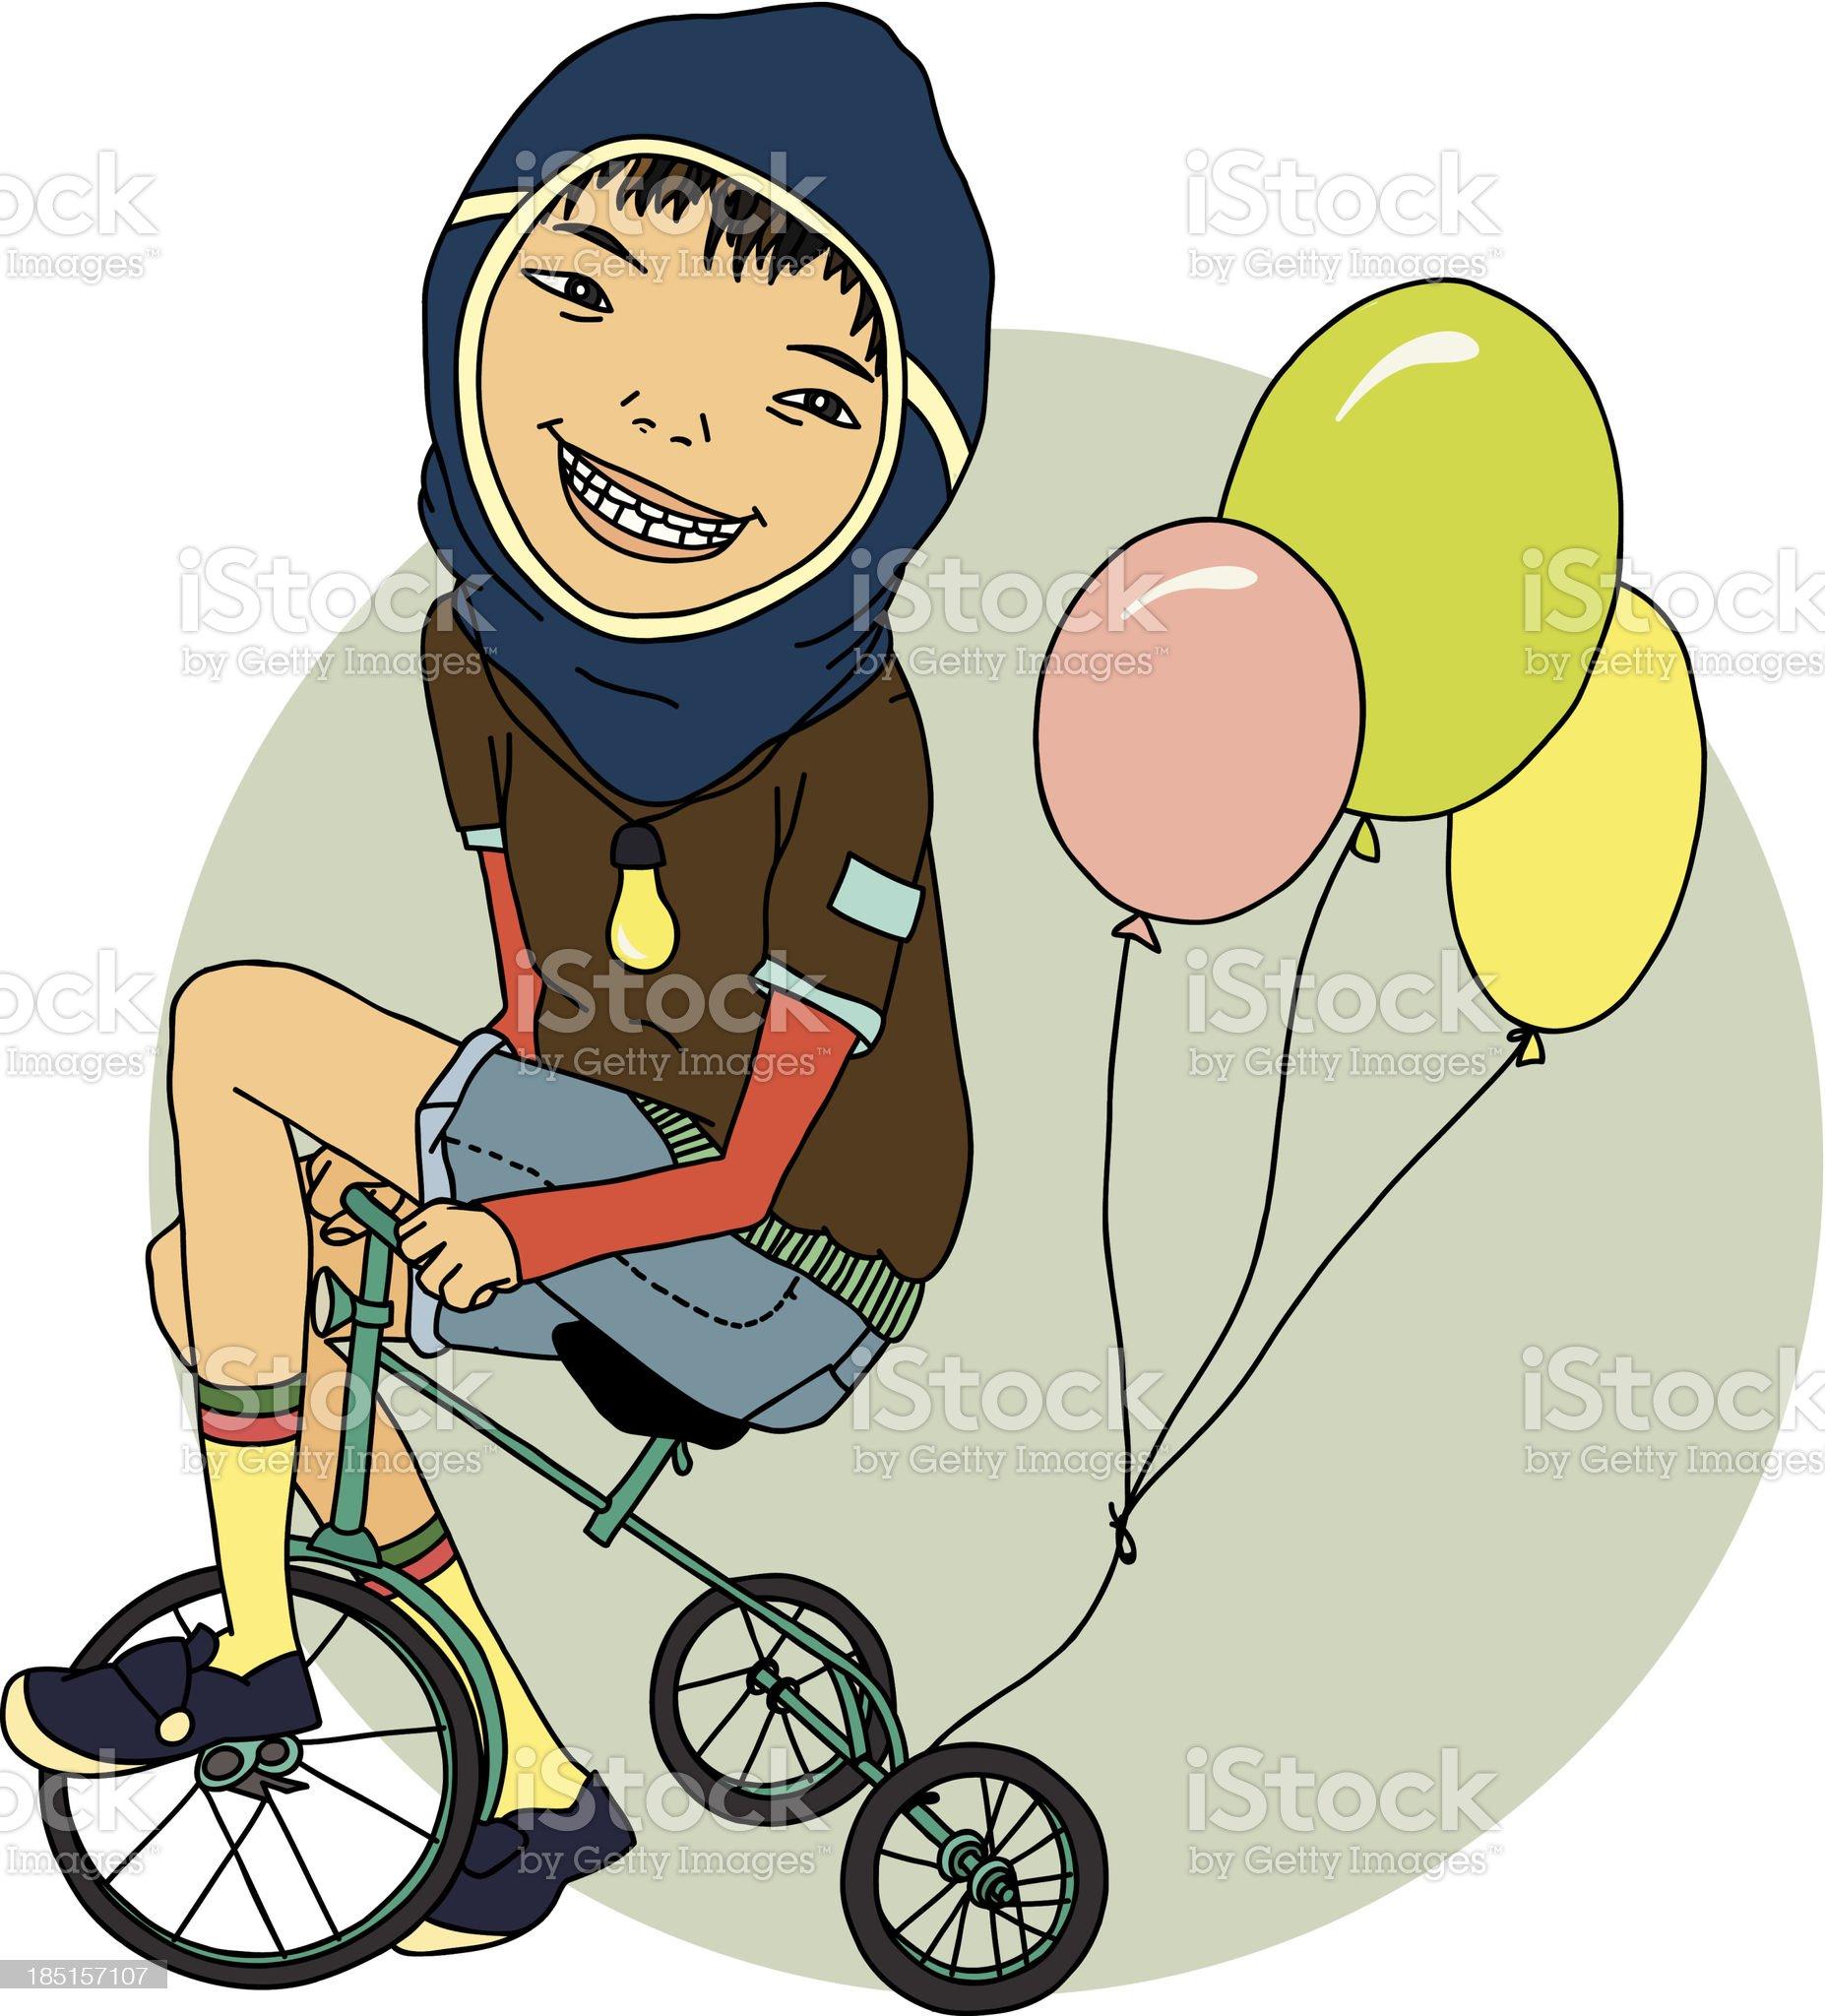 Boy on a bike royalty-free stock vector art